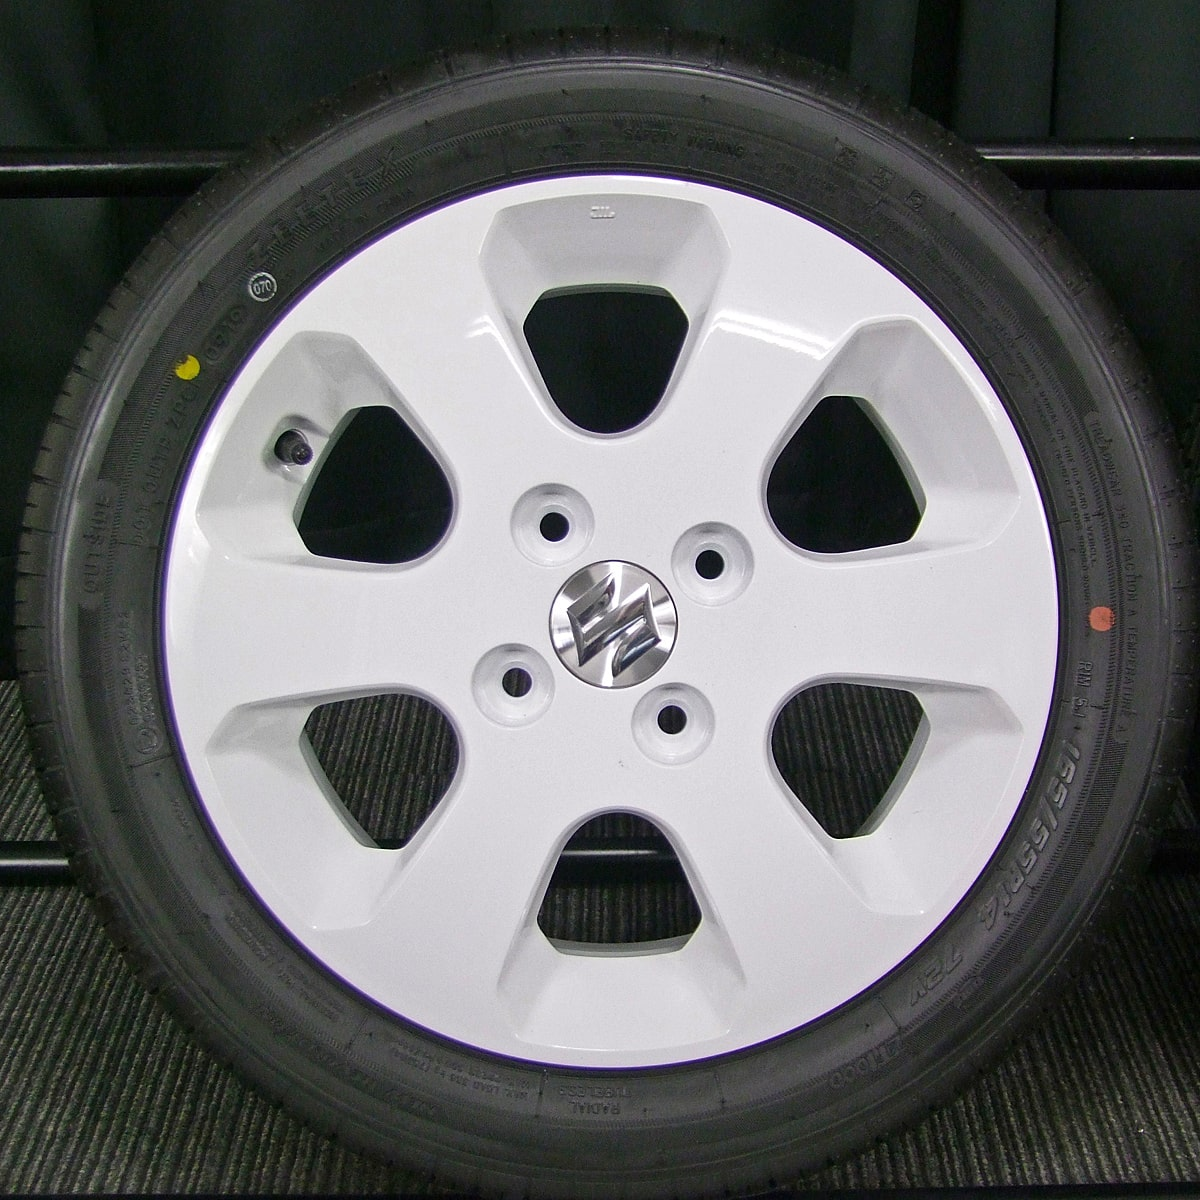 SUZUKI ワゴンR 純正 ホワイト ZEETEX ZT1000 165/55R14 4本SET